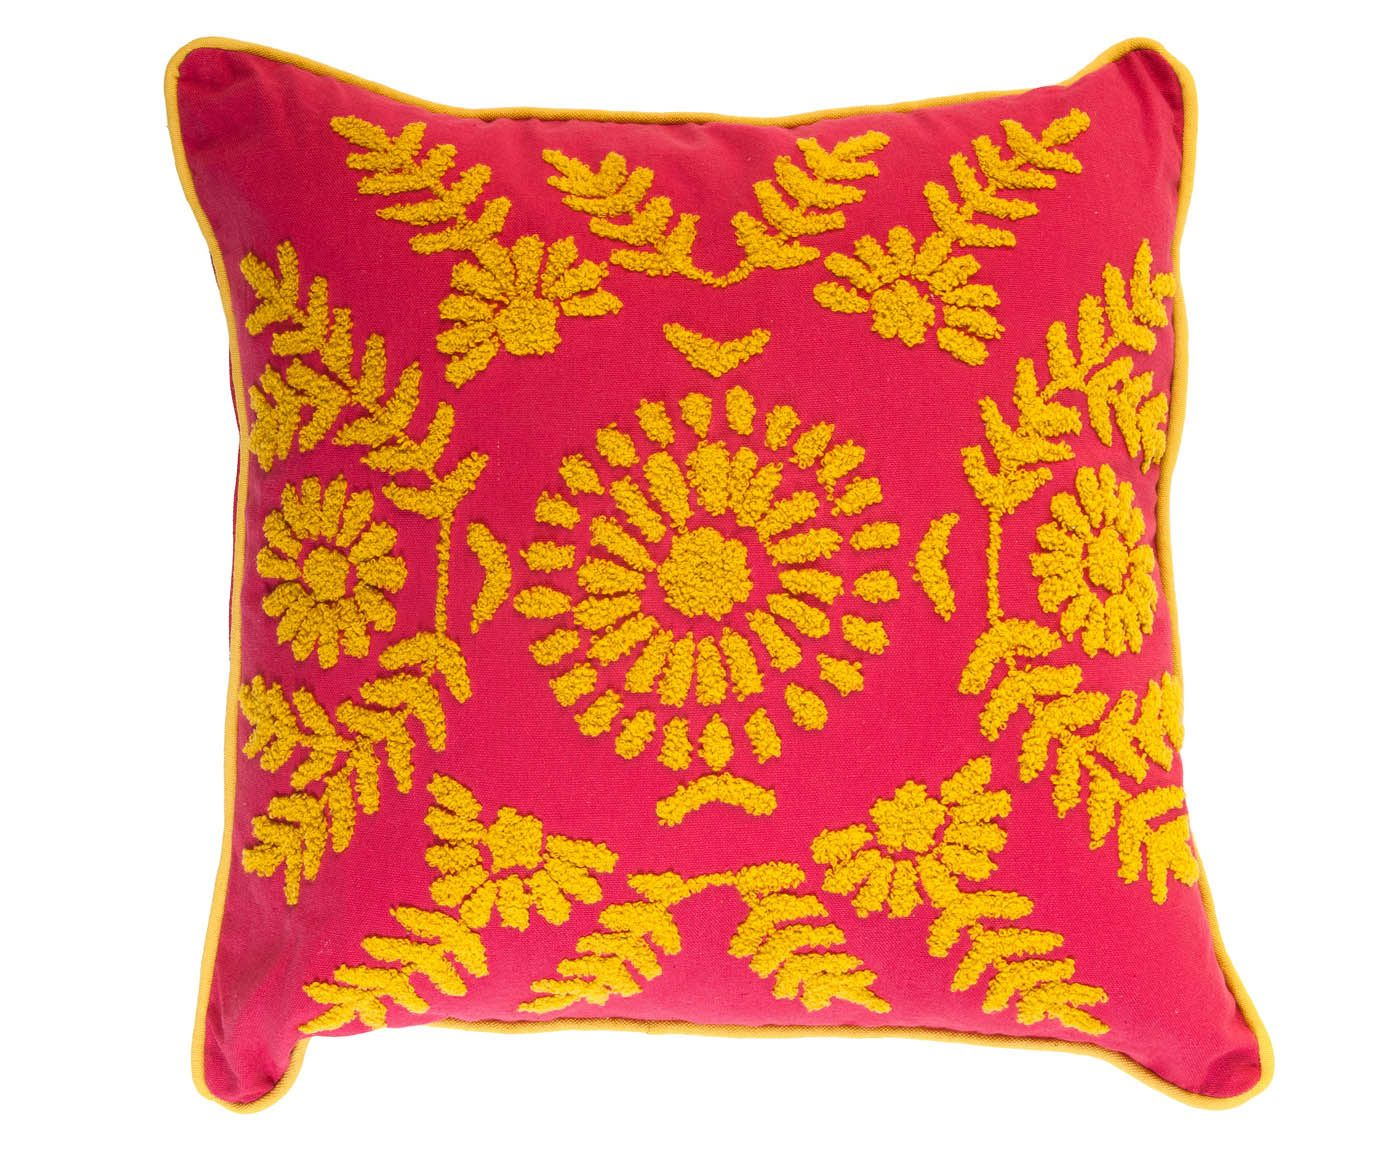 Capa para amofada al sunflower - 45x45cm | Westwing.com.br